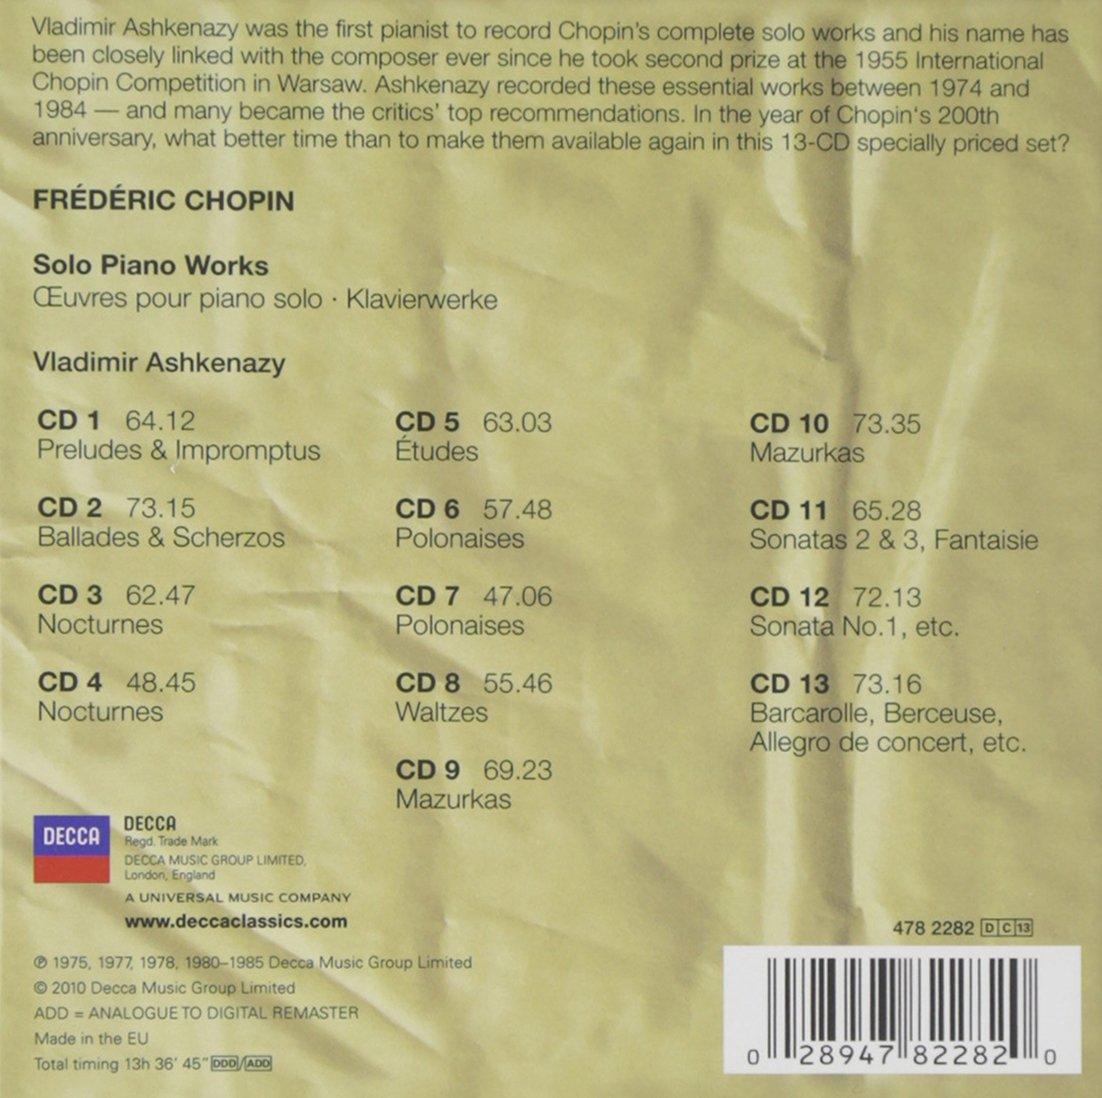 Chopin: Solo Piano Works by Decca